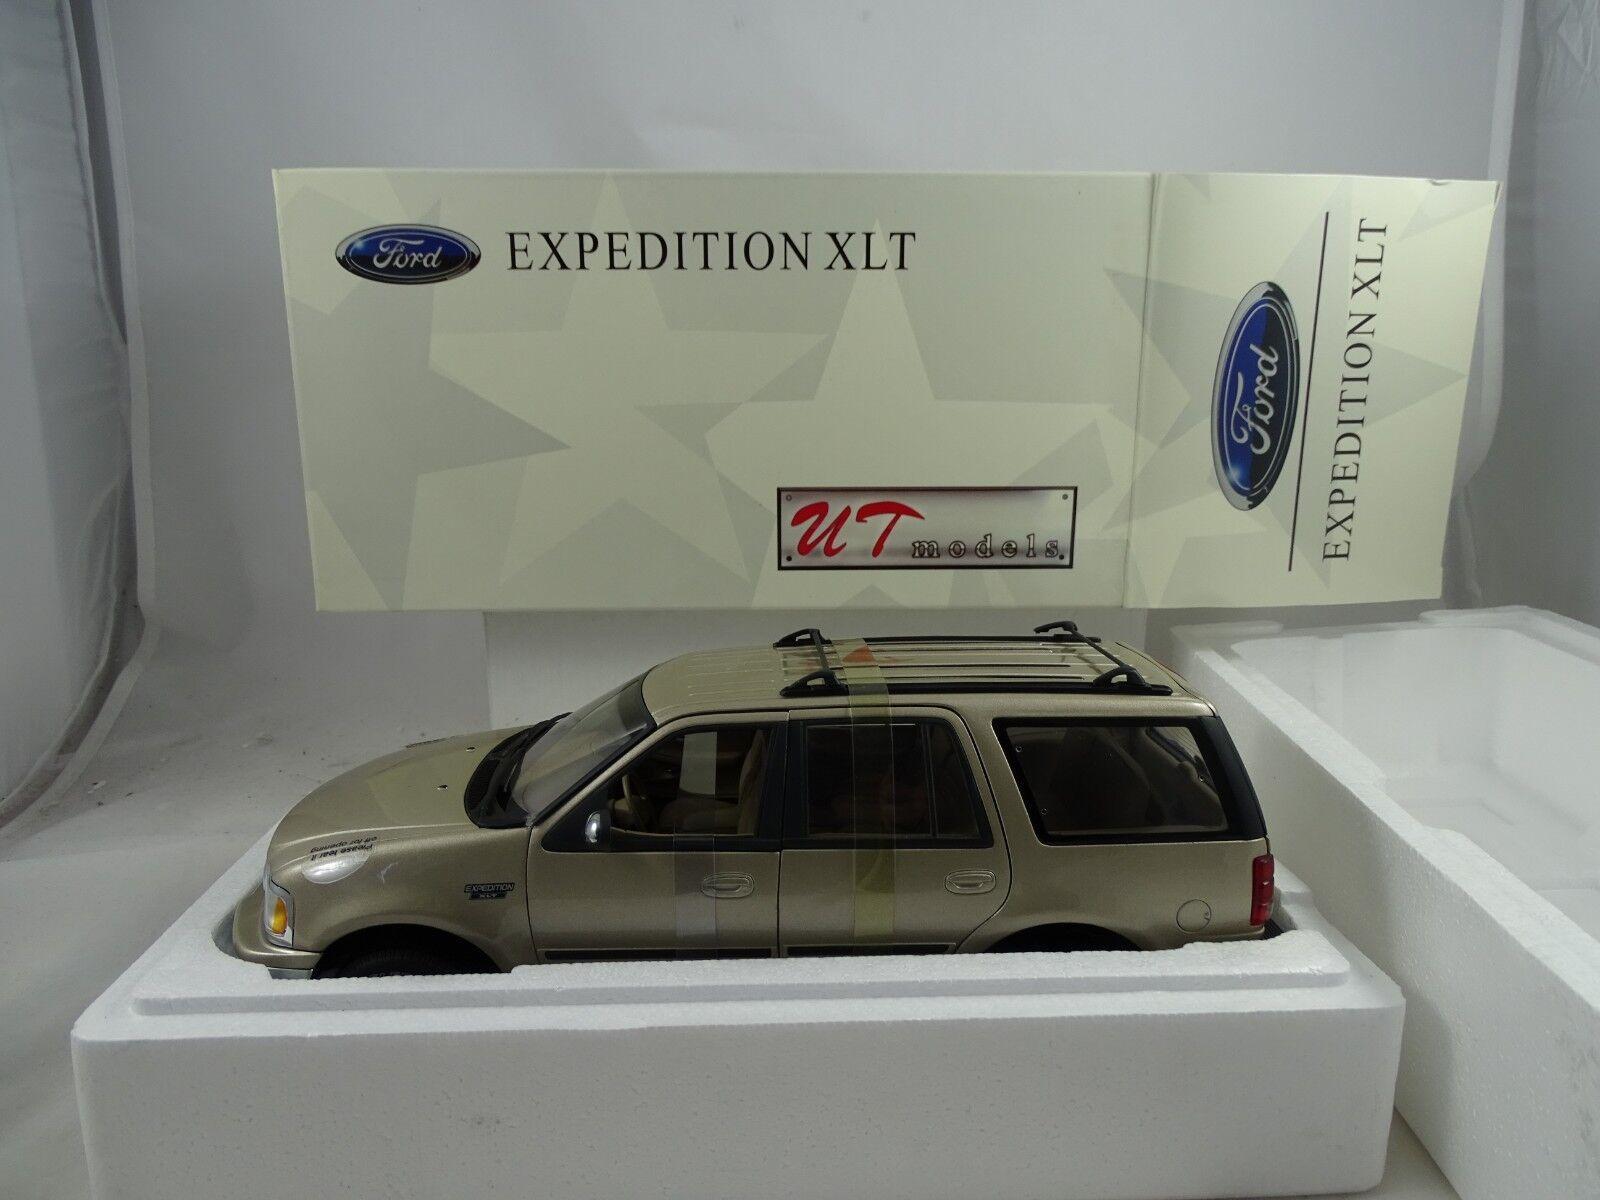 18 ut   autoart   22716 ford expedition xlt metallisches Gold - rarit regelmäßig ä t §